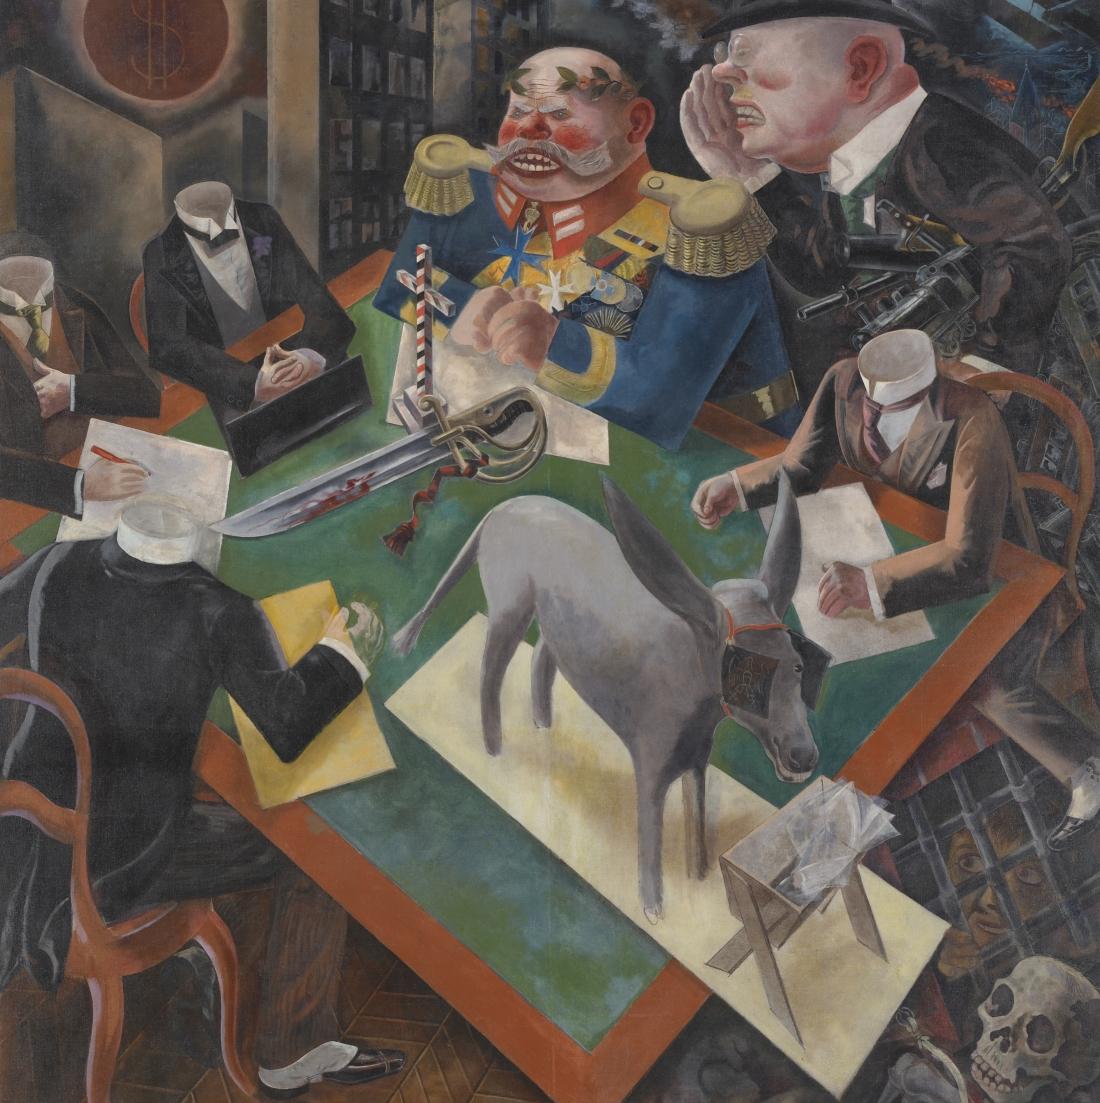 On Art in Weimar Germany